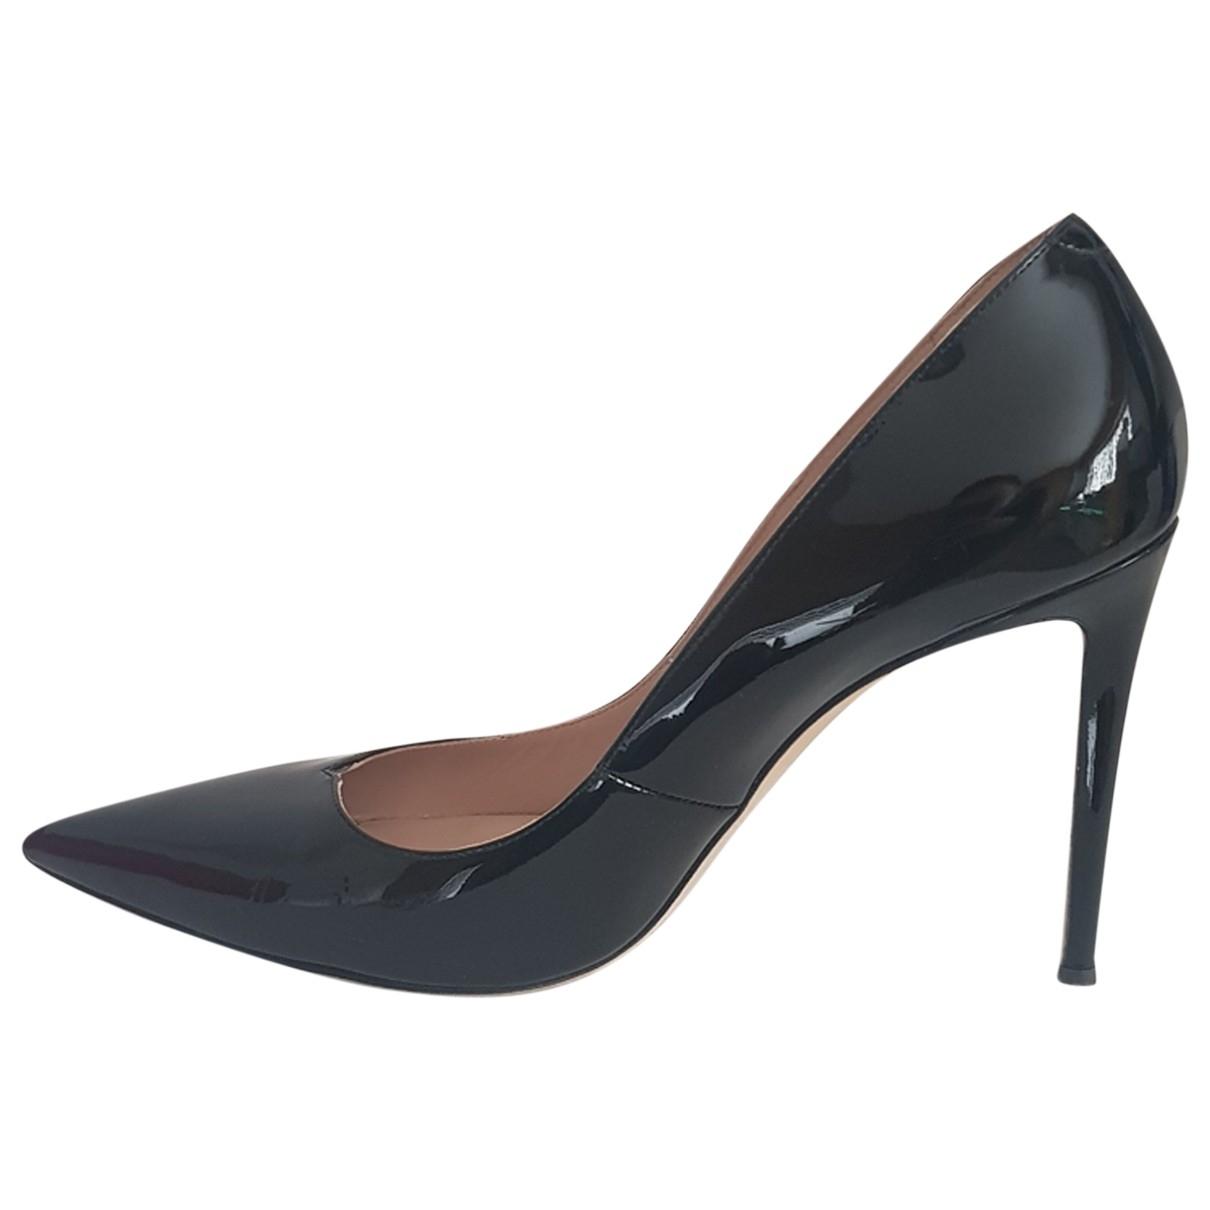 Giuseppe Zanotti \N Black Patent leather Heels for Women 41 EU